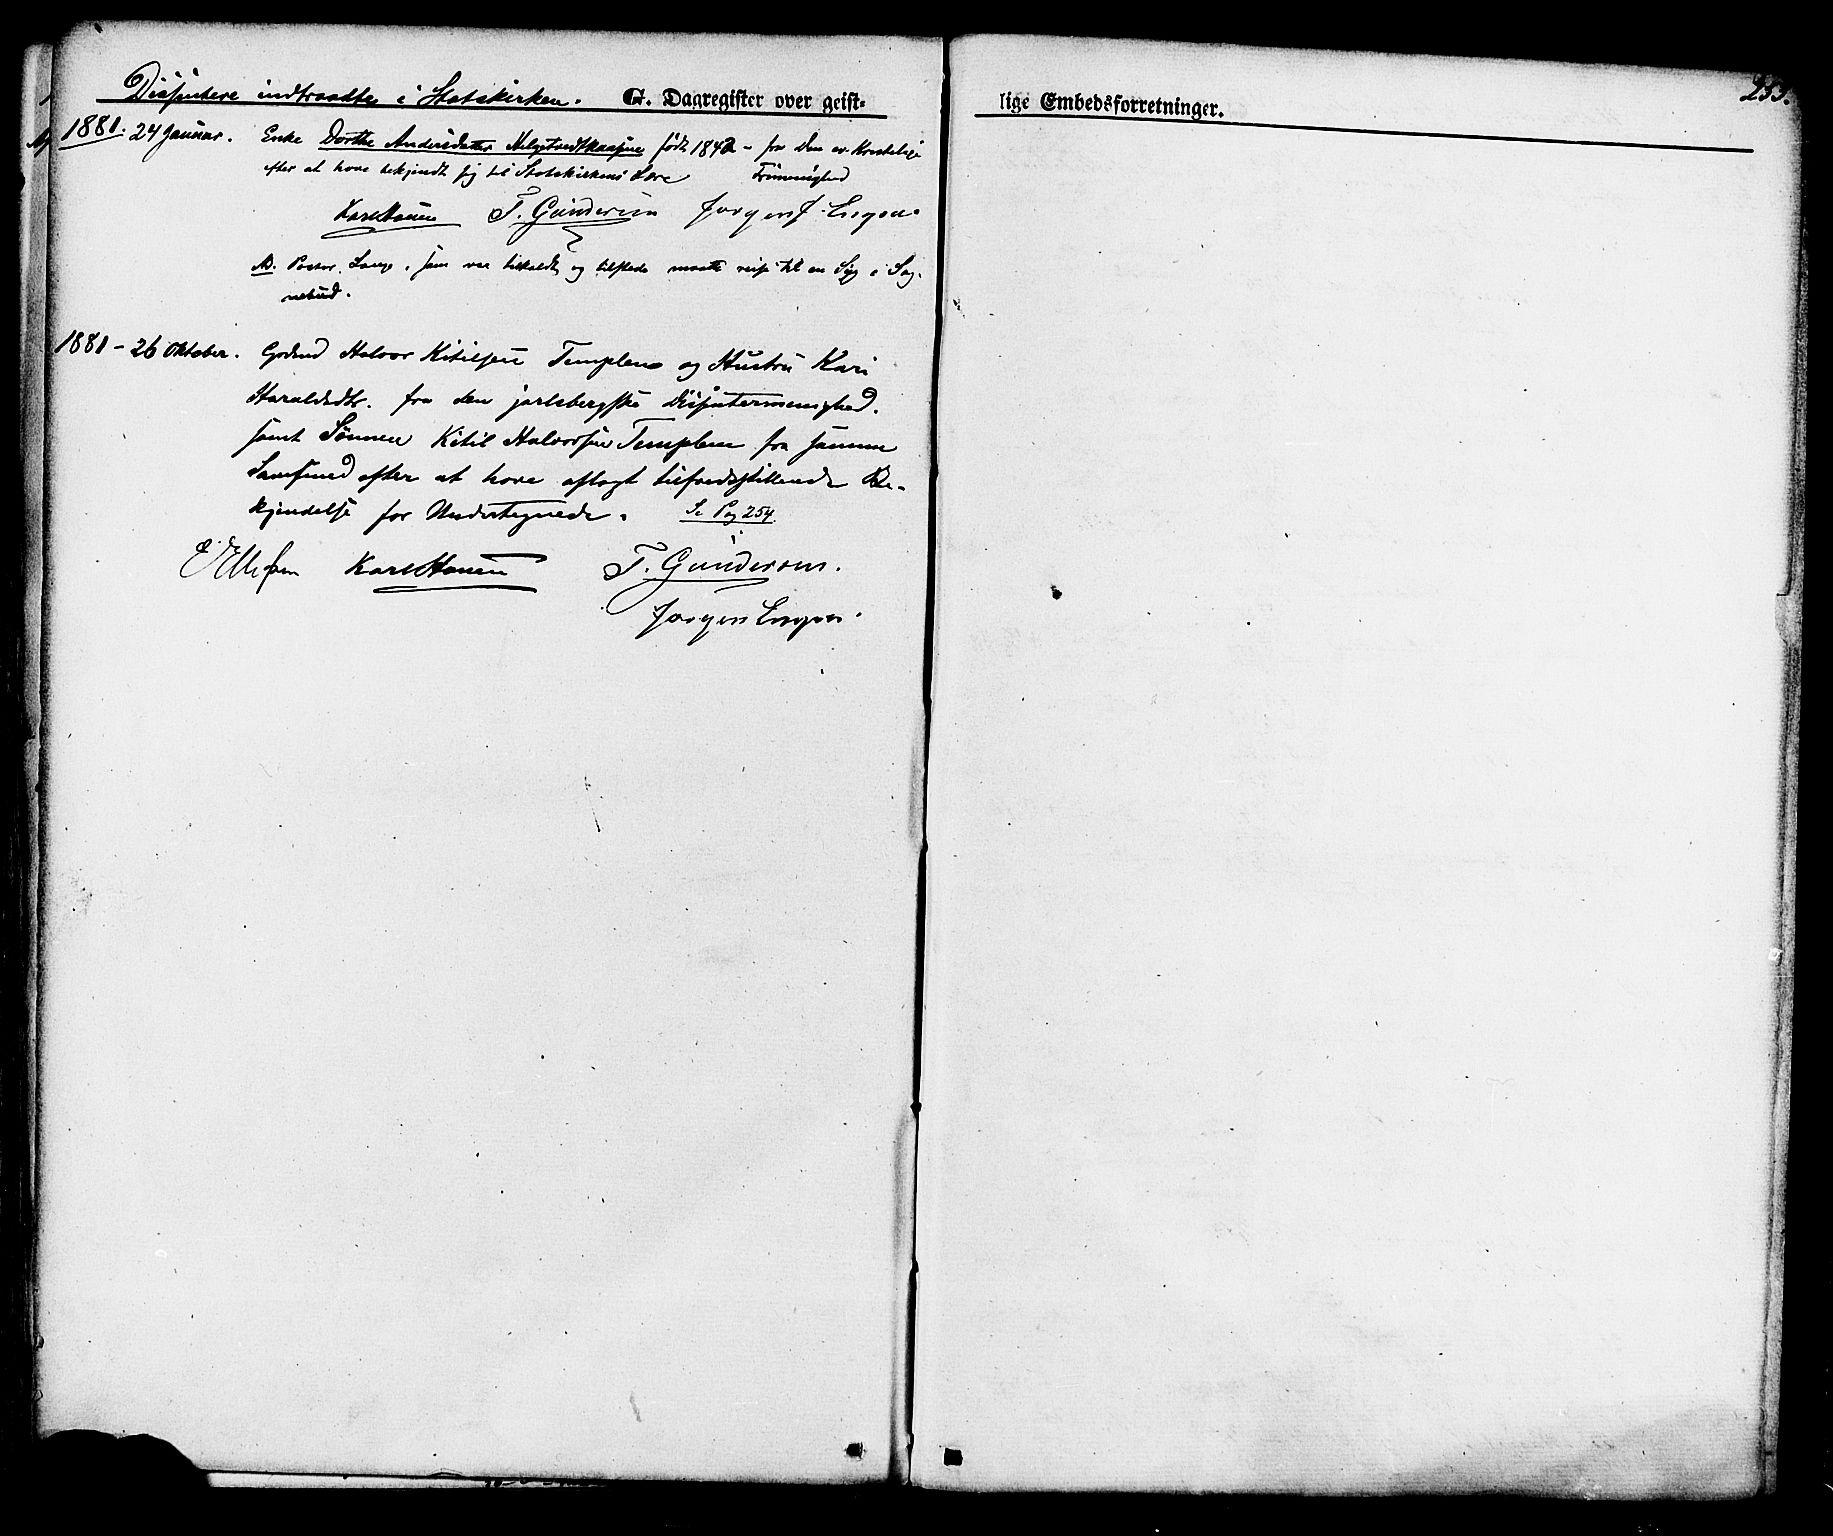 SAKO, Lunde kirkebøker, F/Fa/L0001: Ministerialbok nr. I 1, 1866-1883, s. 253